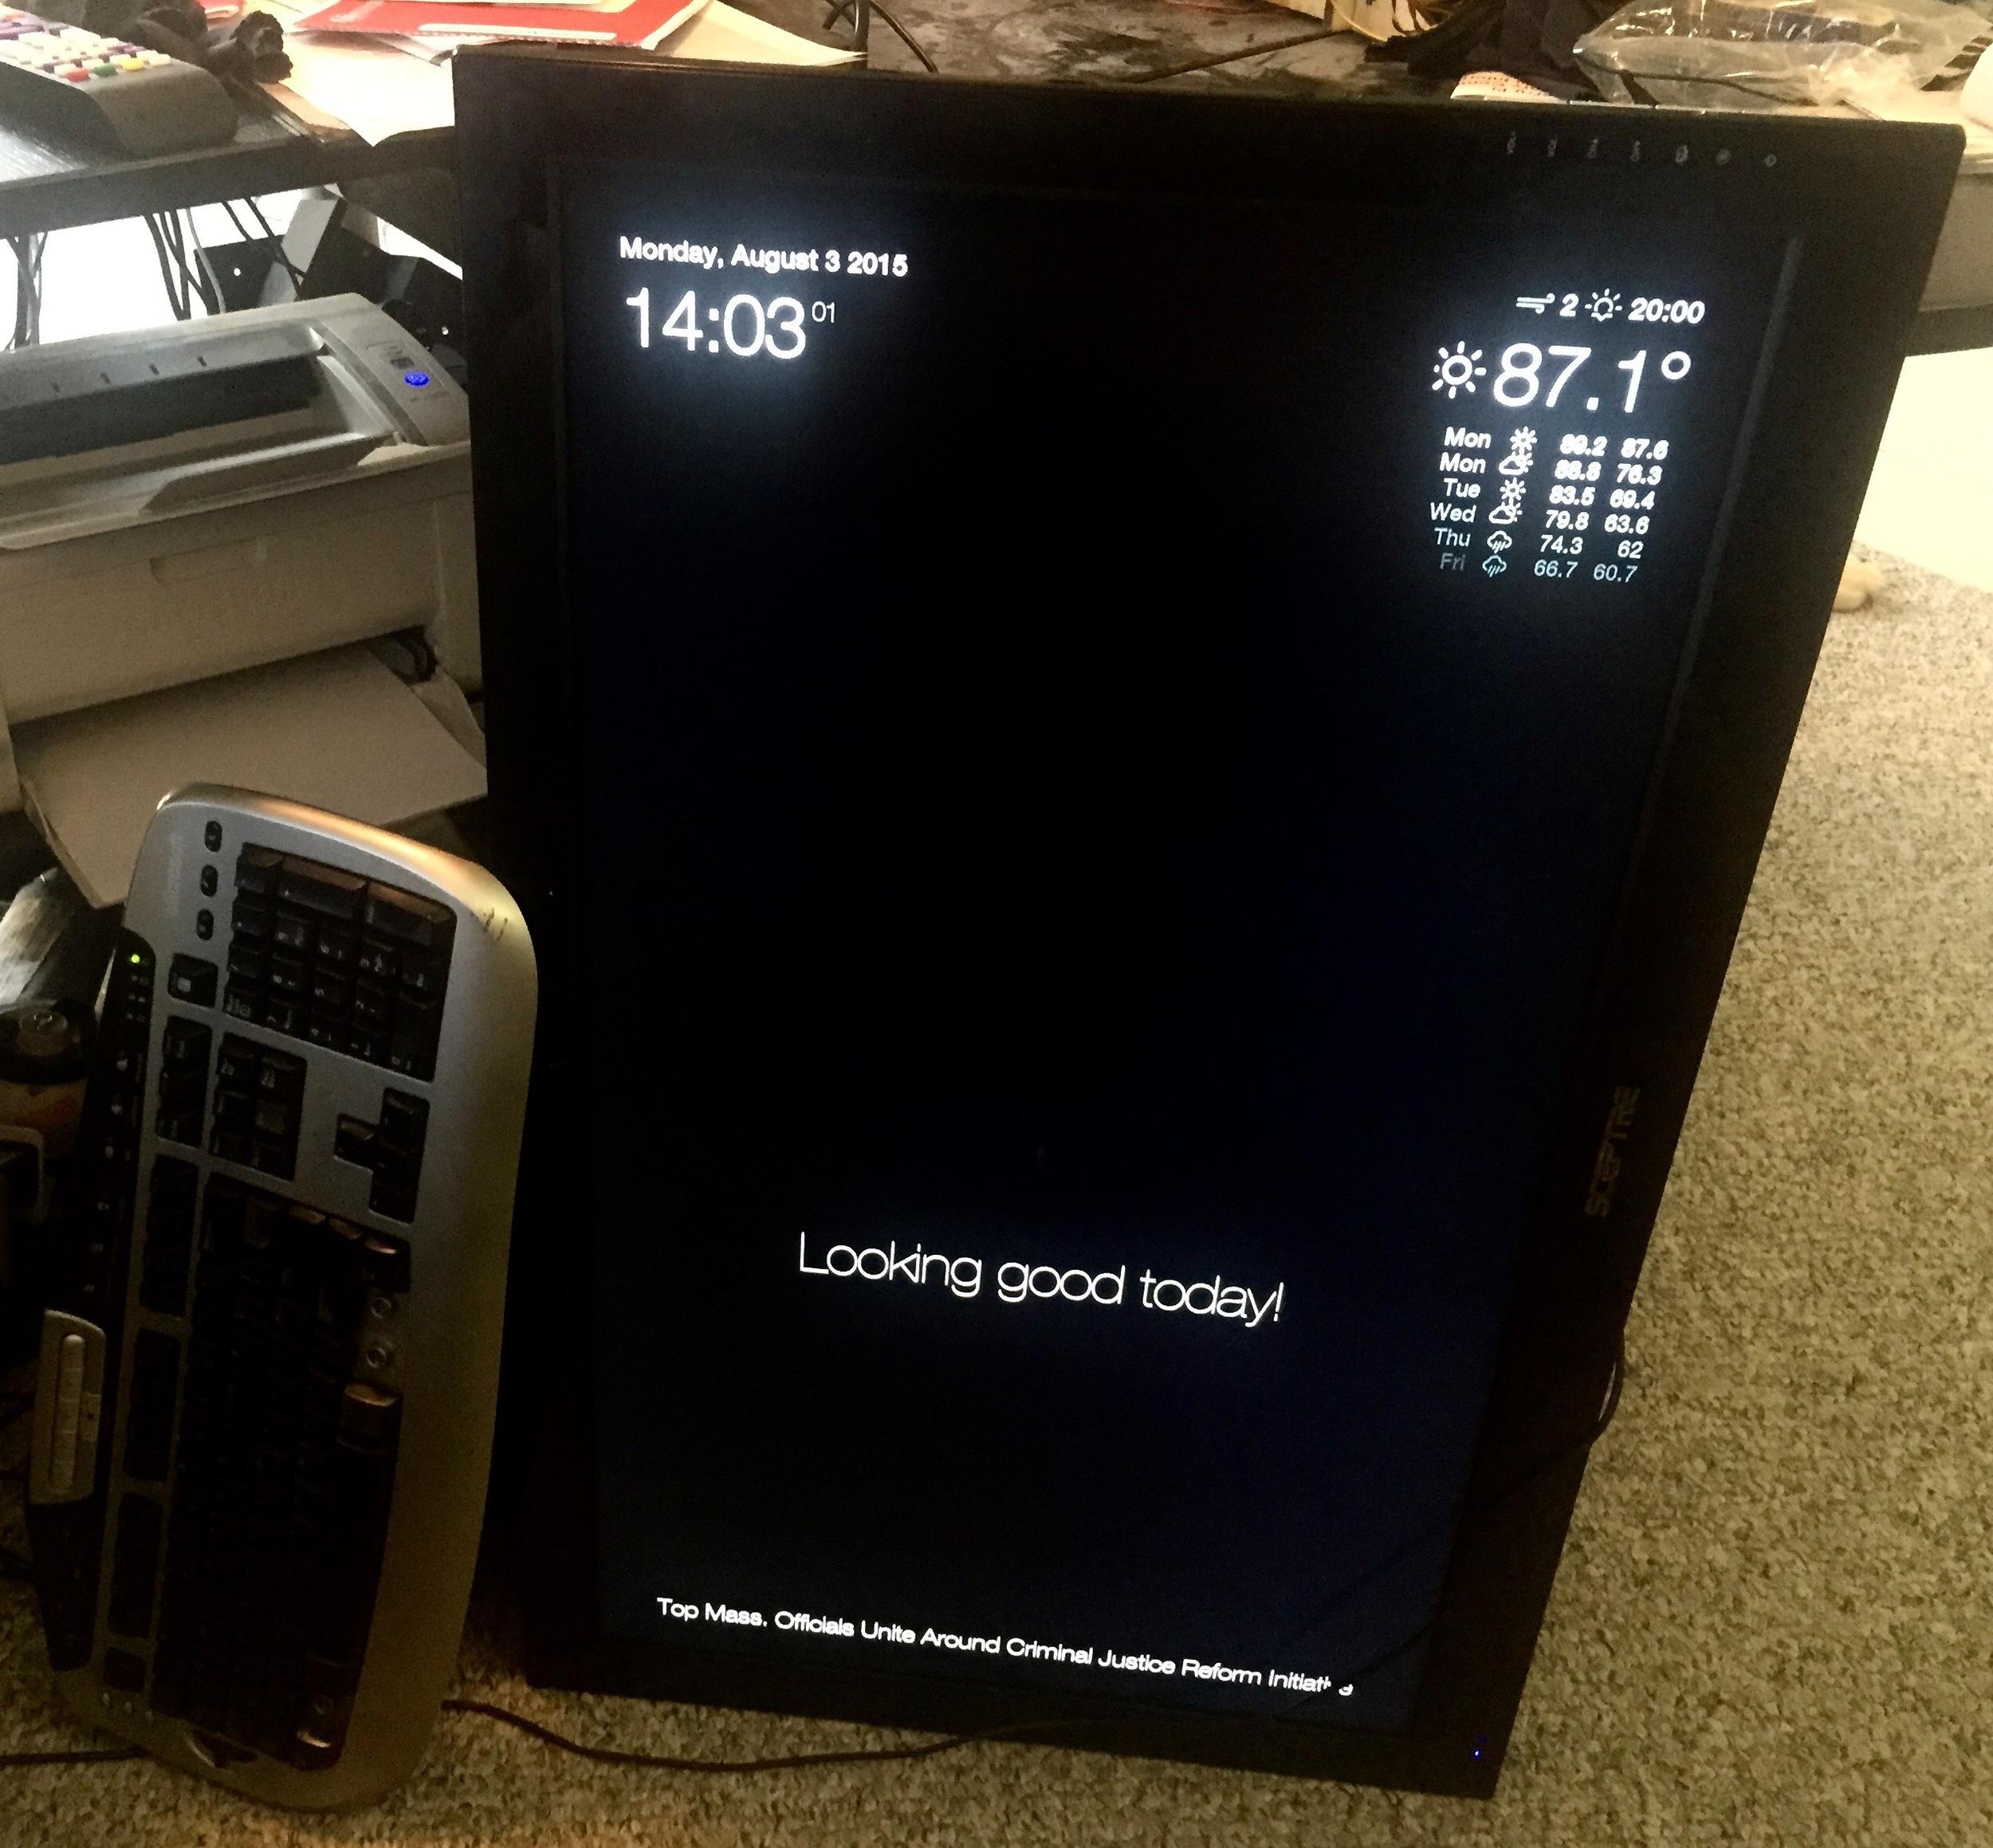 Raspberry Pi installed on the sideways TV running the Magic Mirror website.